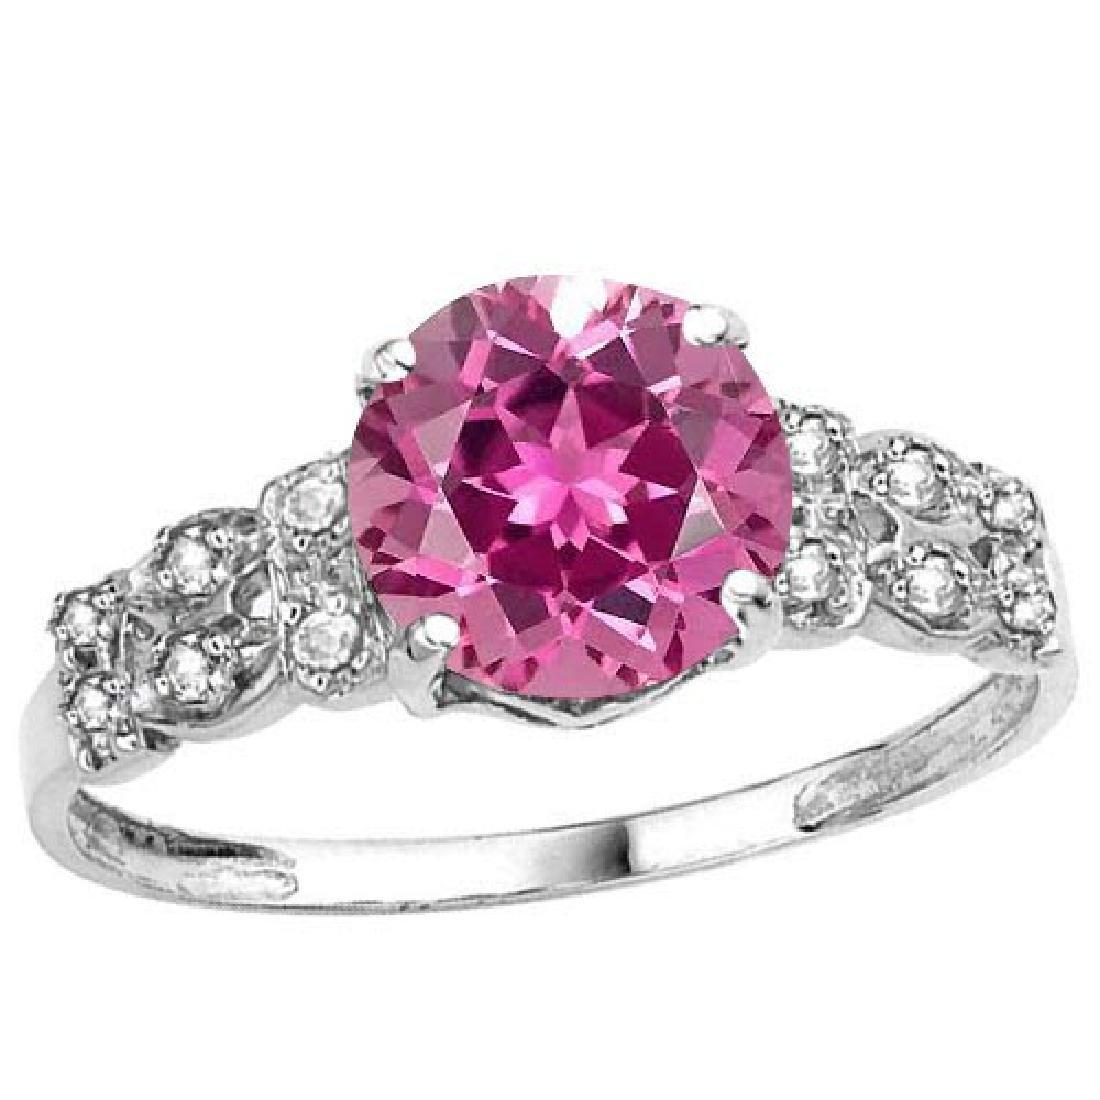 Certified 1.18 Ctw. Genuine Pink tourmaline And Diamond